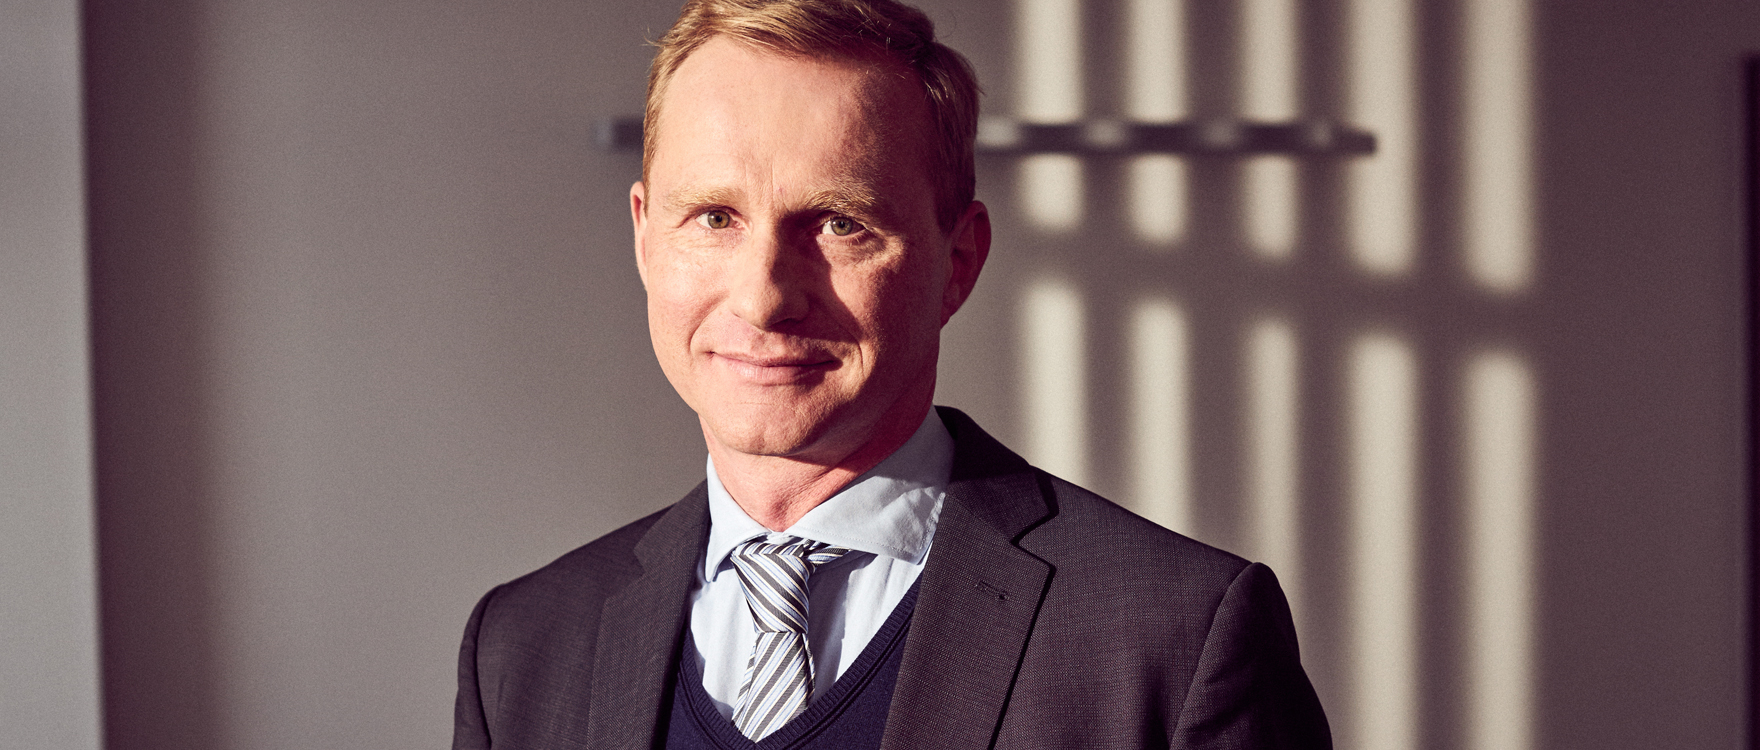 Ulf Berlitz